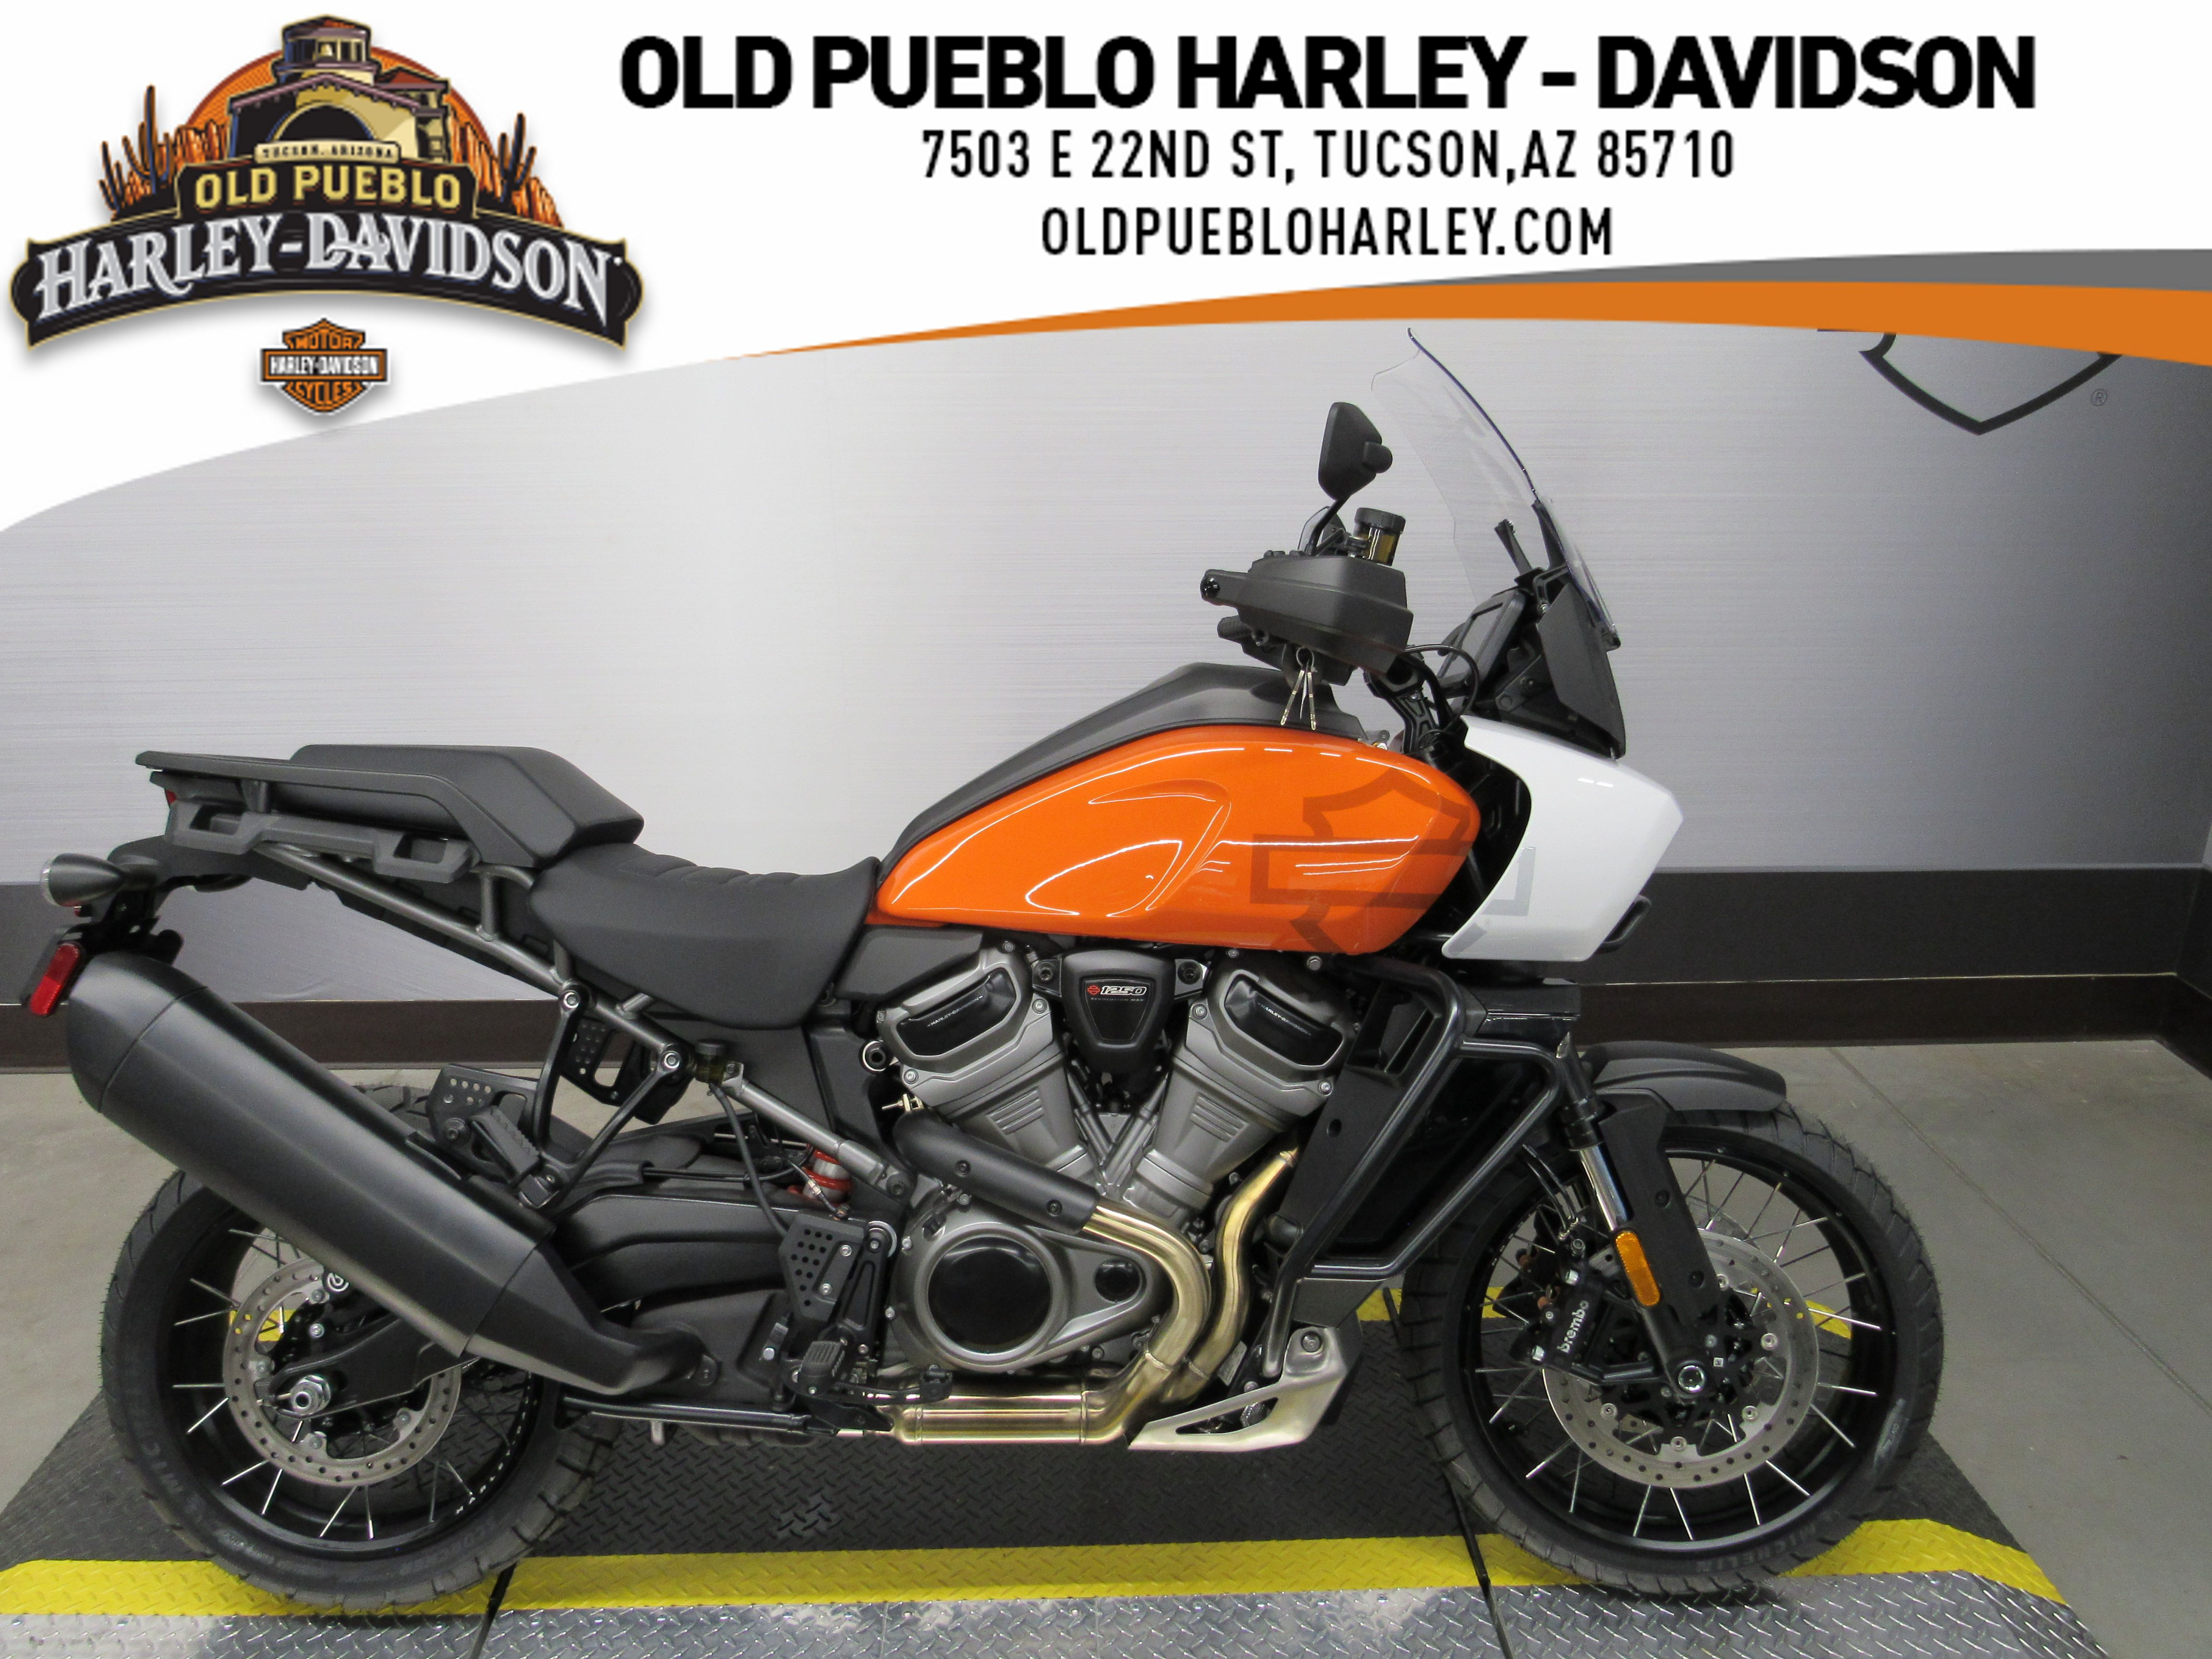 New 2021 Harley-Davidson Pan America 1250 Special